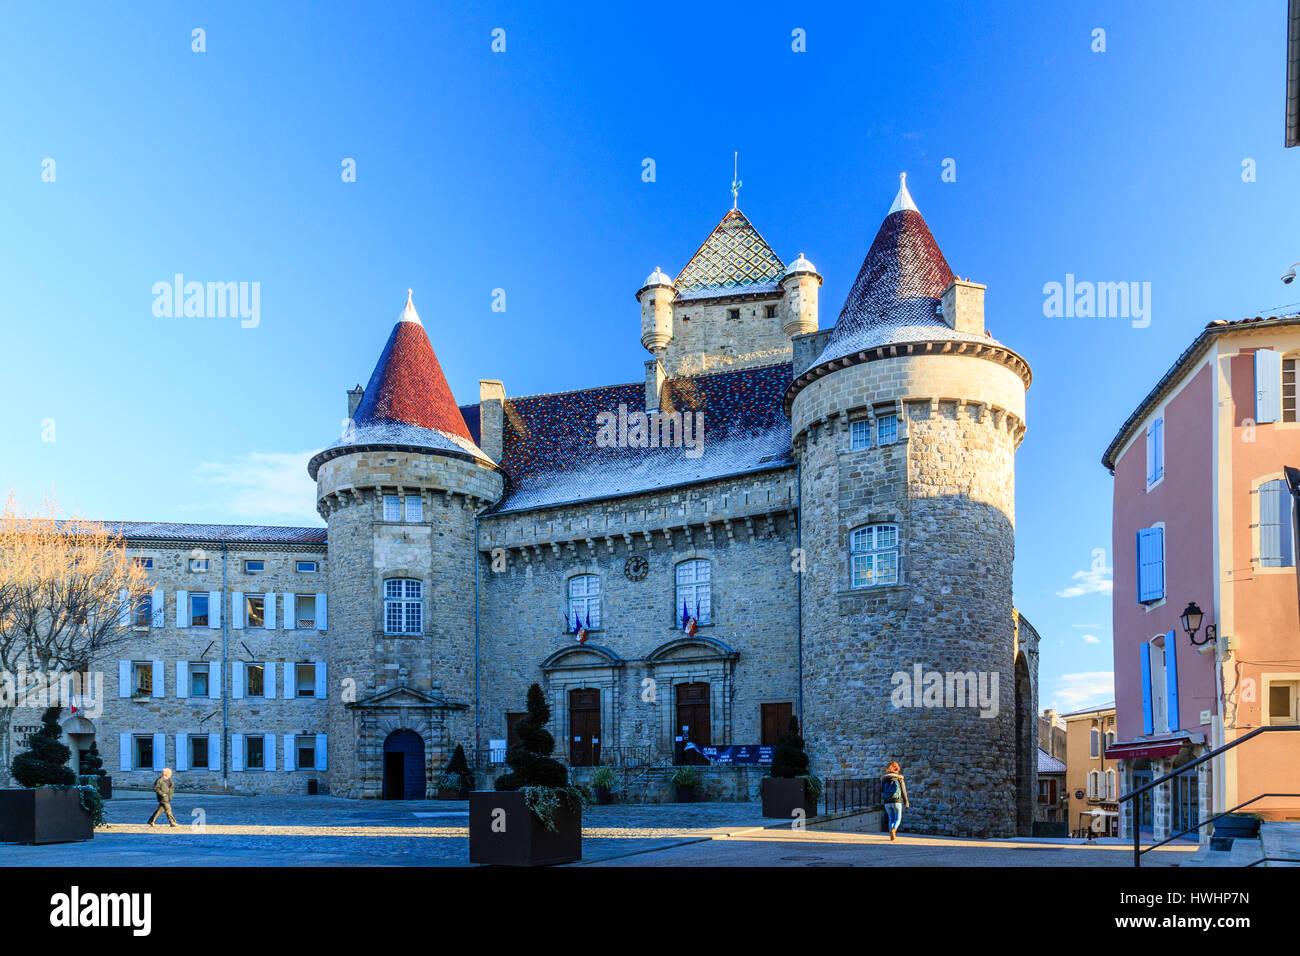 / France, Ardeche, Aubenas, the castle in winter - Stock Image